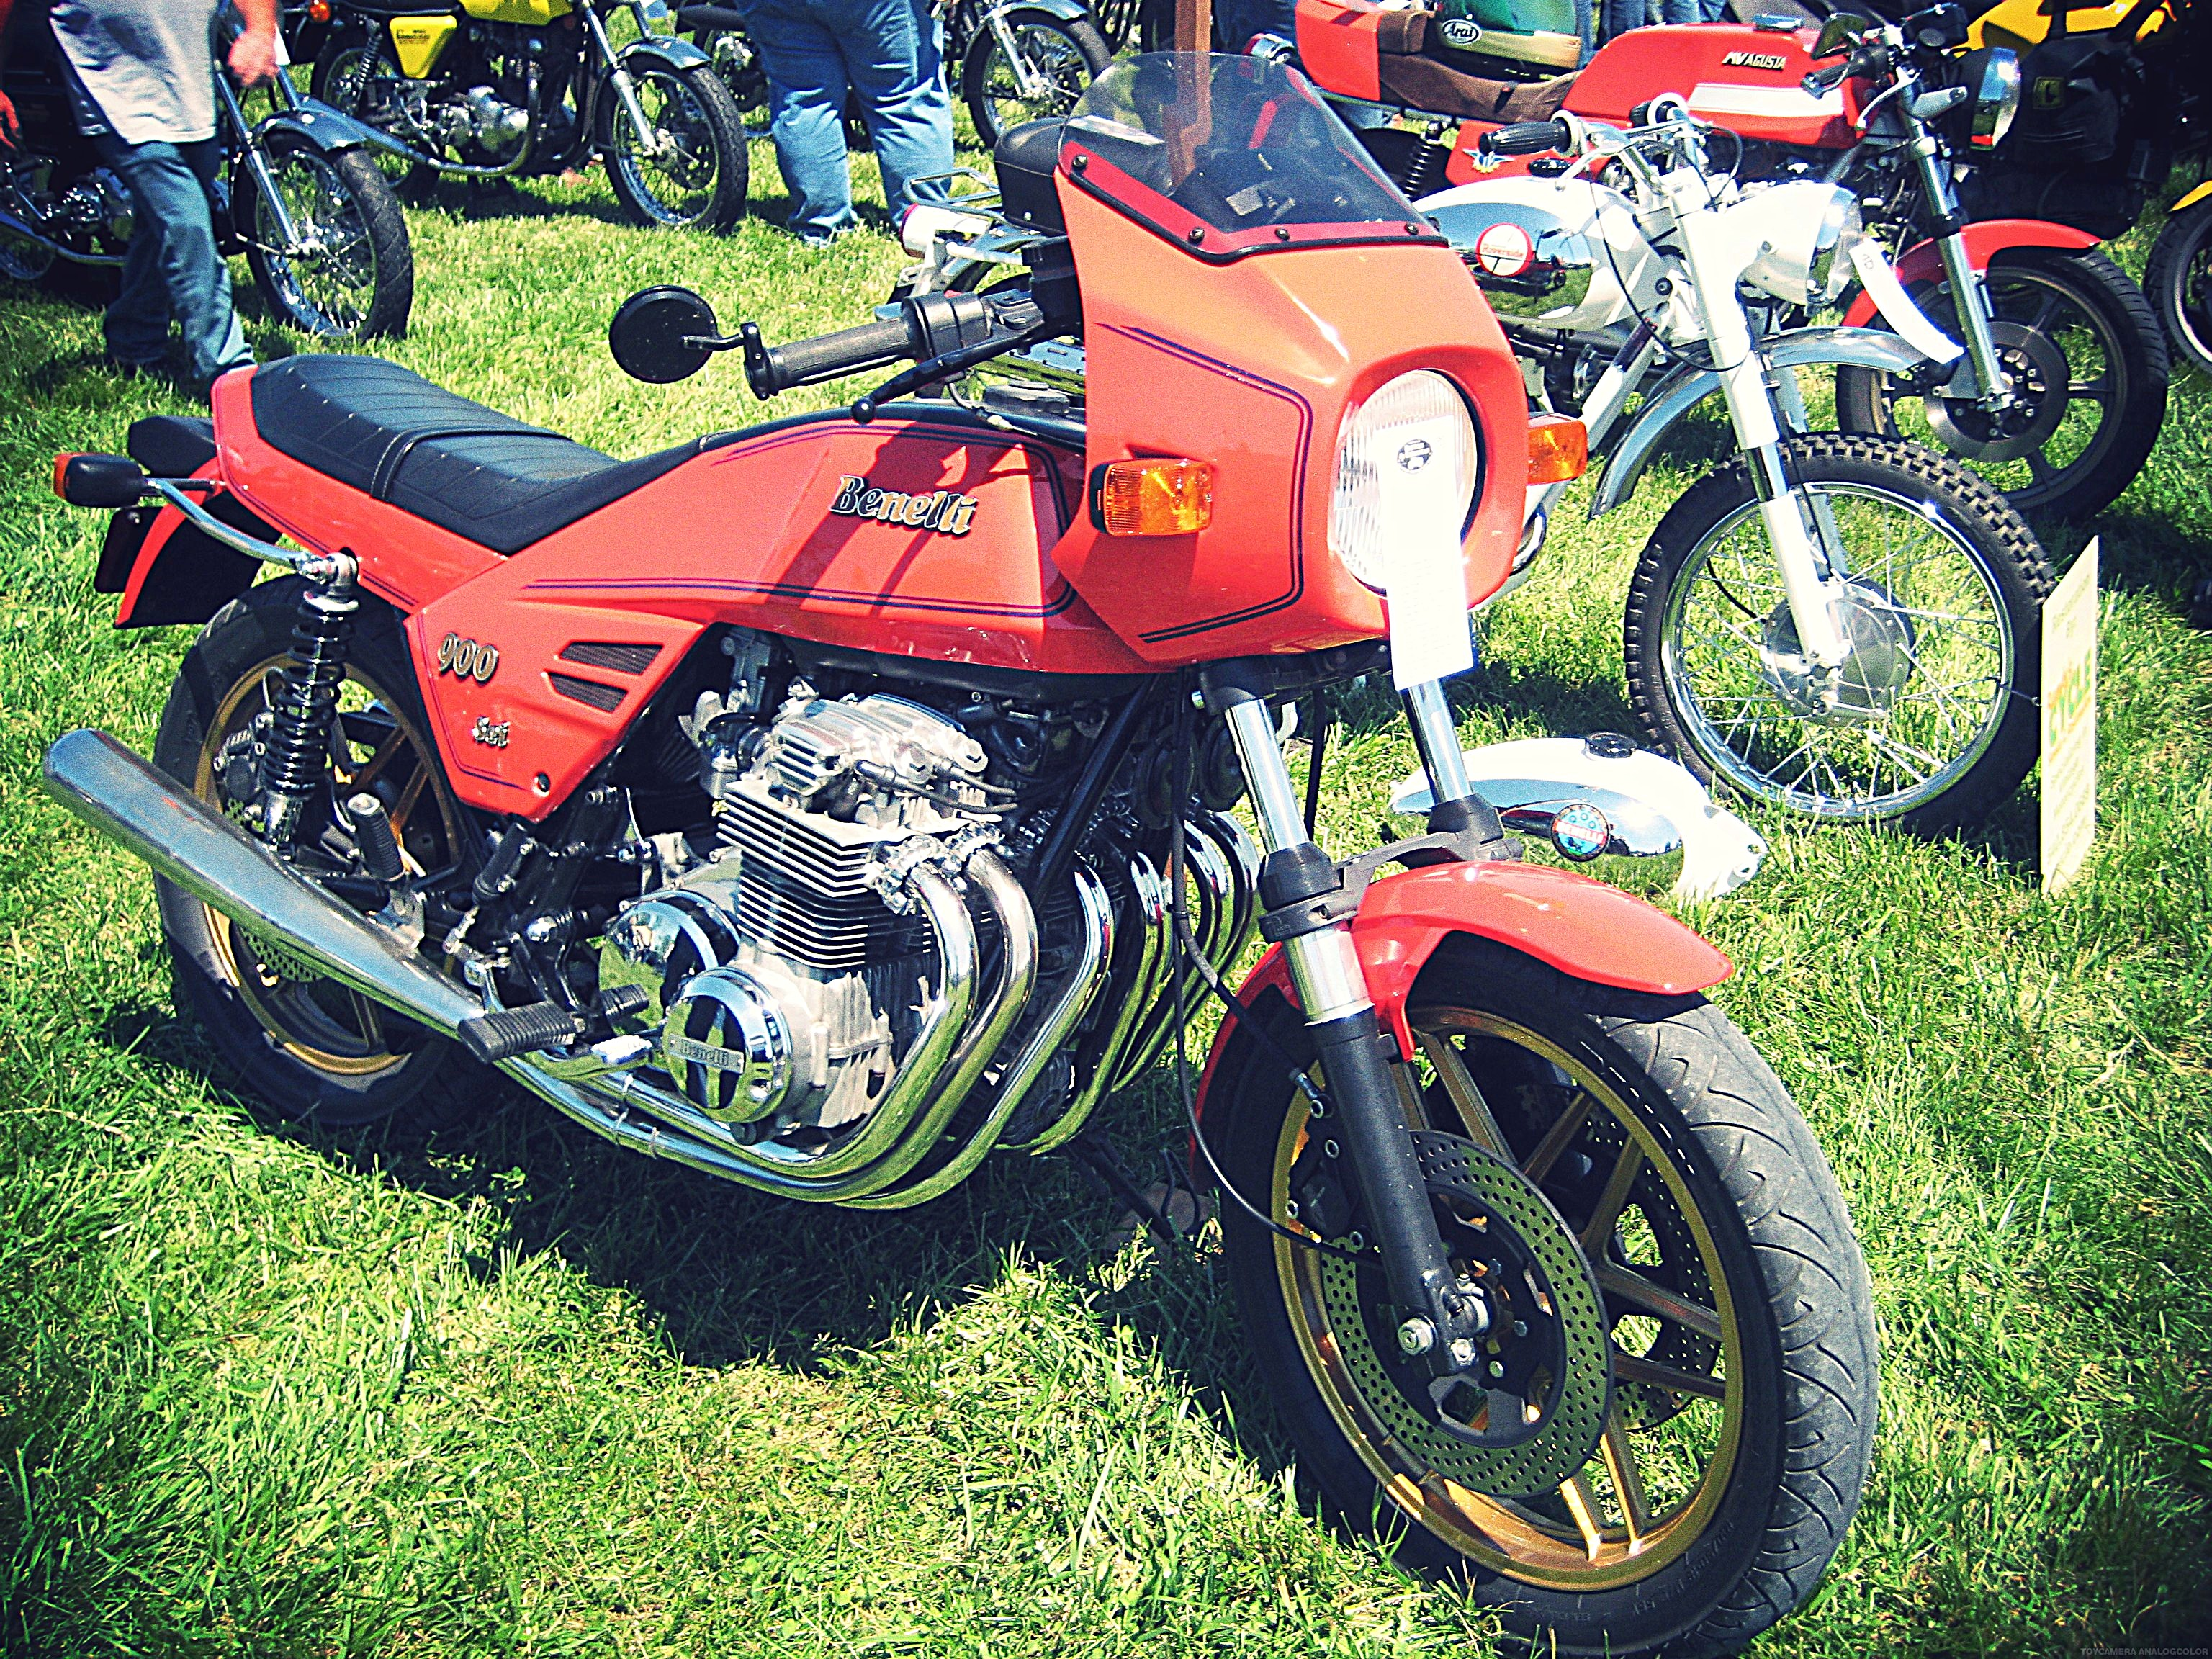 Vintage Benelli 900 Motorcycle